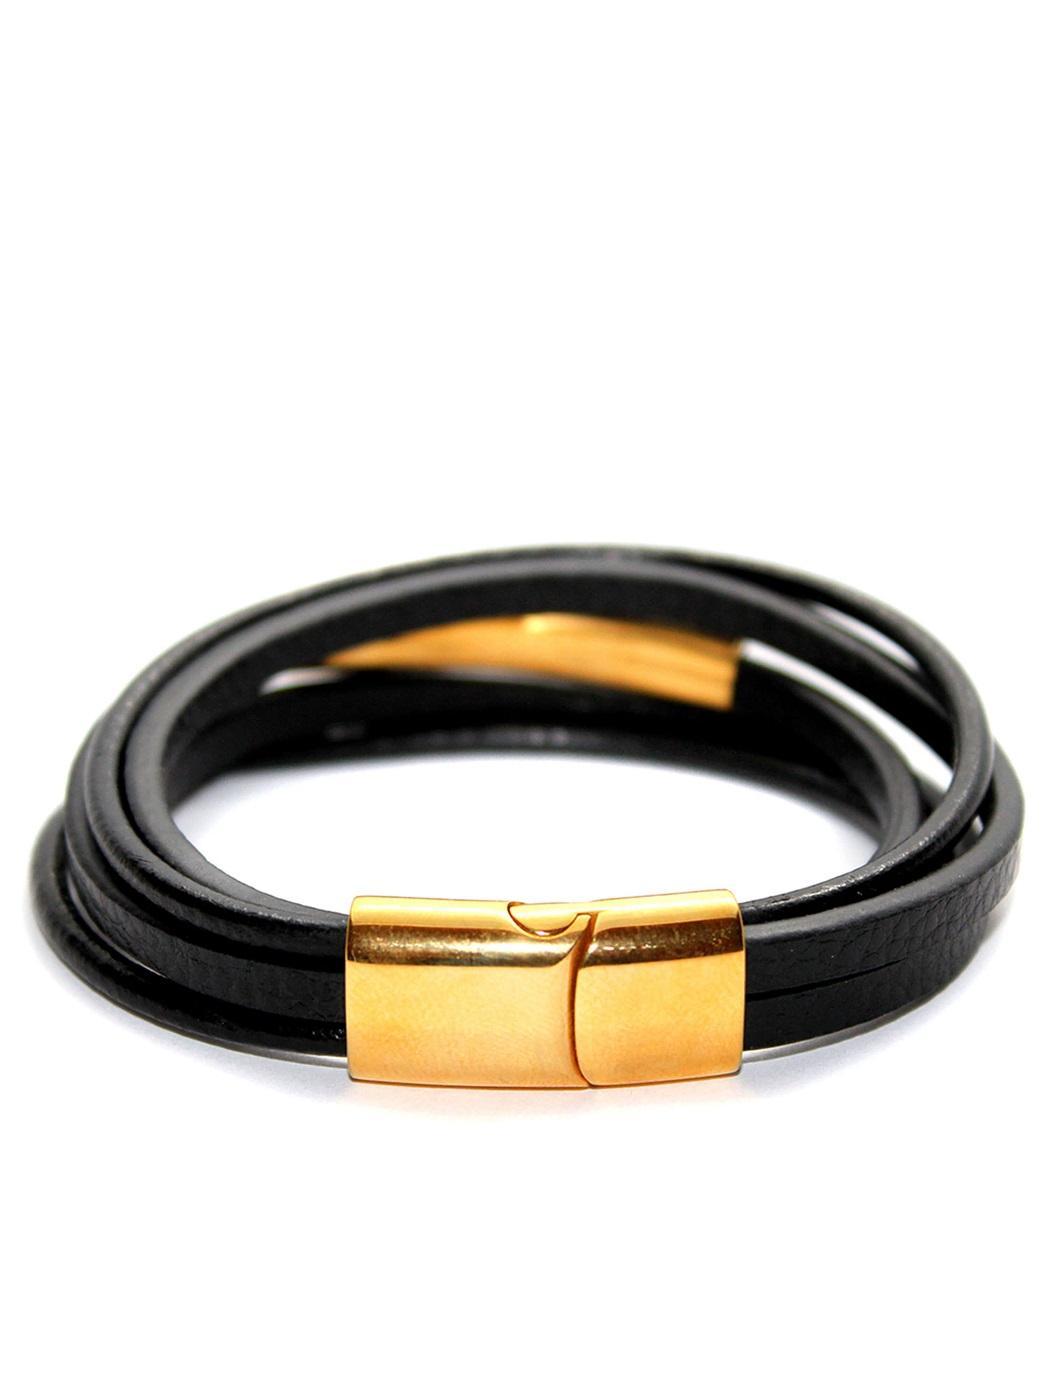 Mens Gold Wrist Bracelet